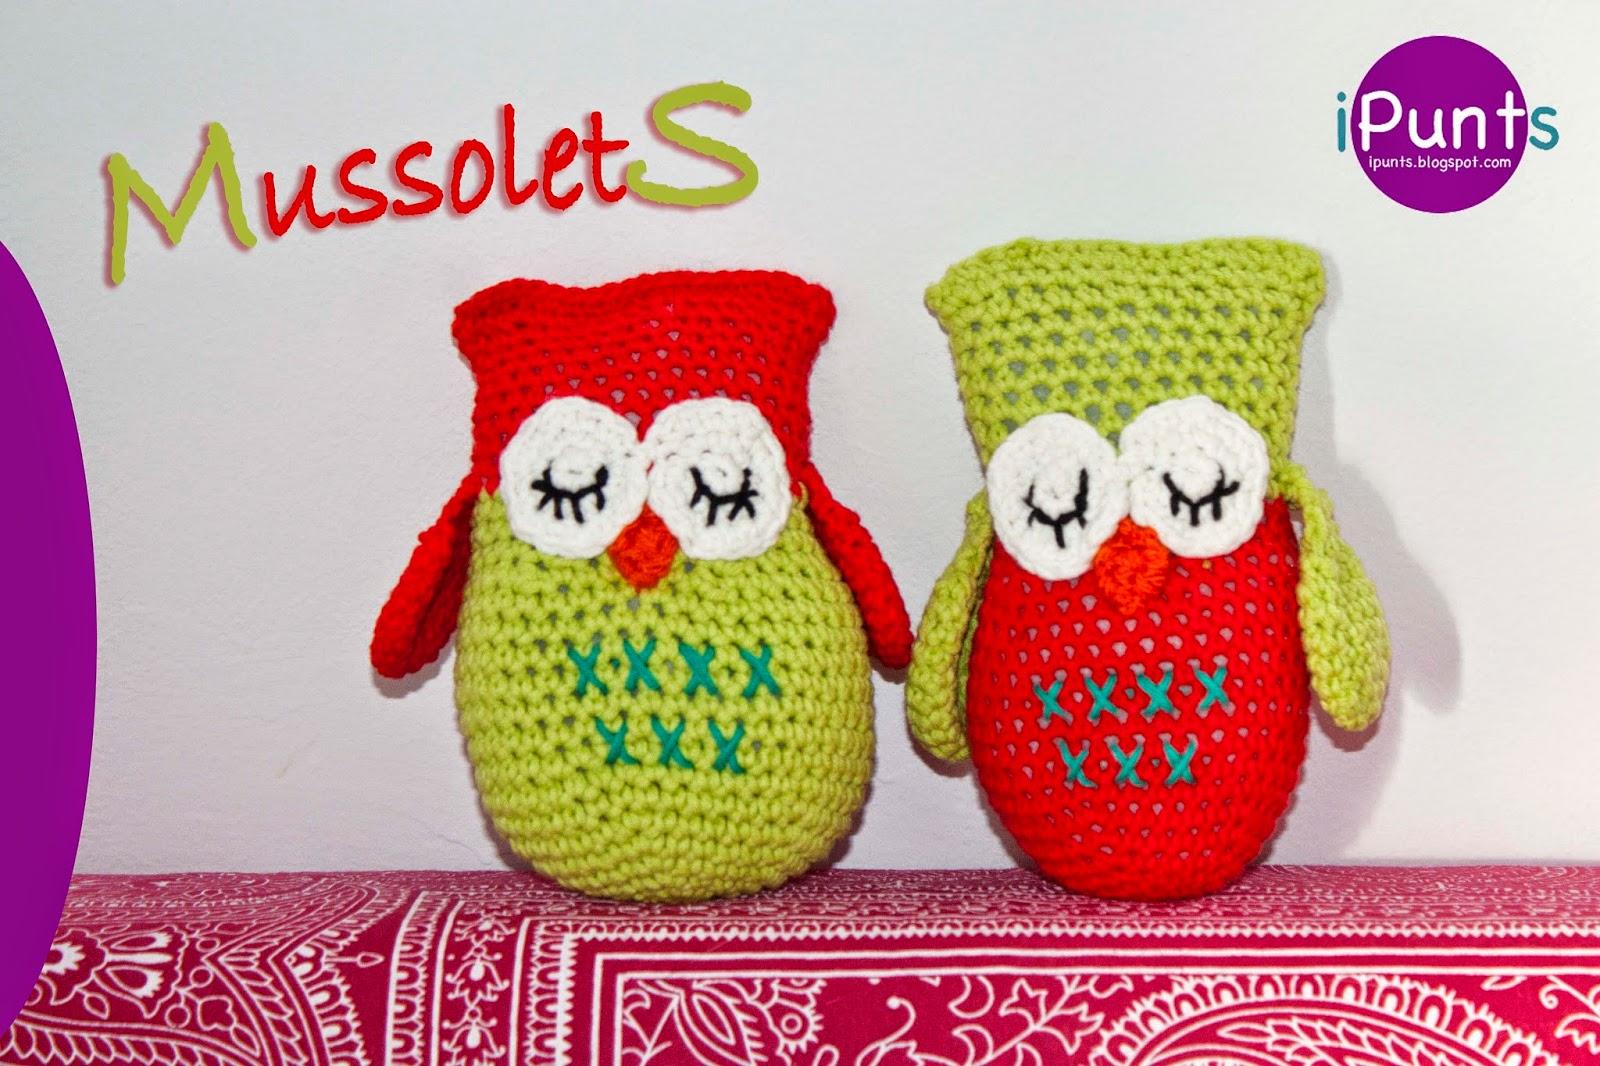 buho patron amigurumi crochet ganchillo lana muñeco ipunts